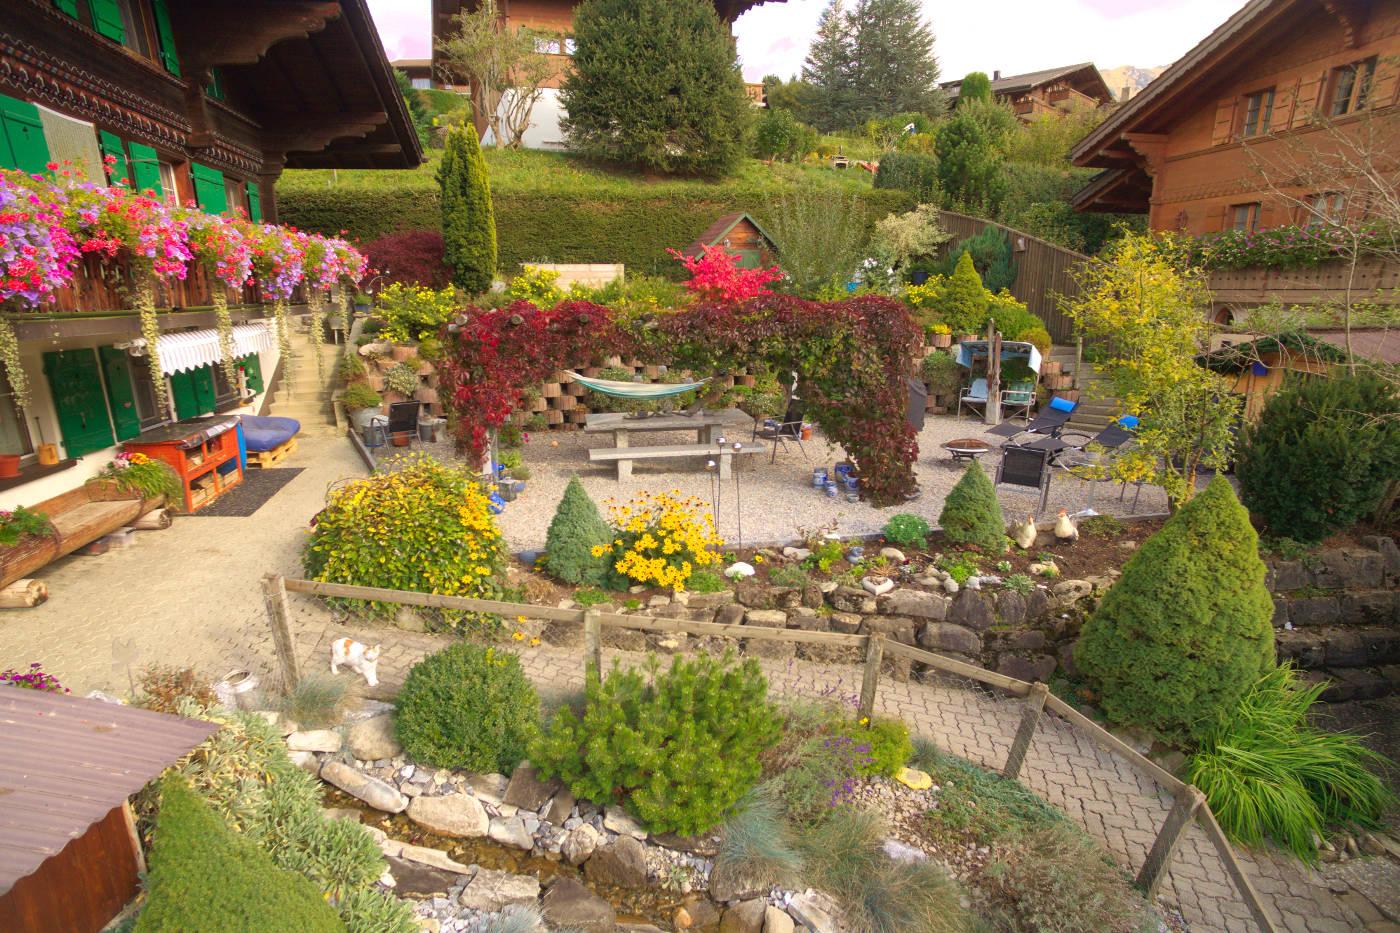 Lawn and flower works - reneschopfer.ch